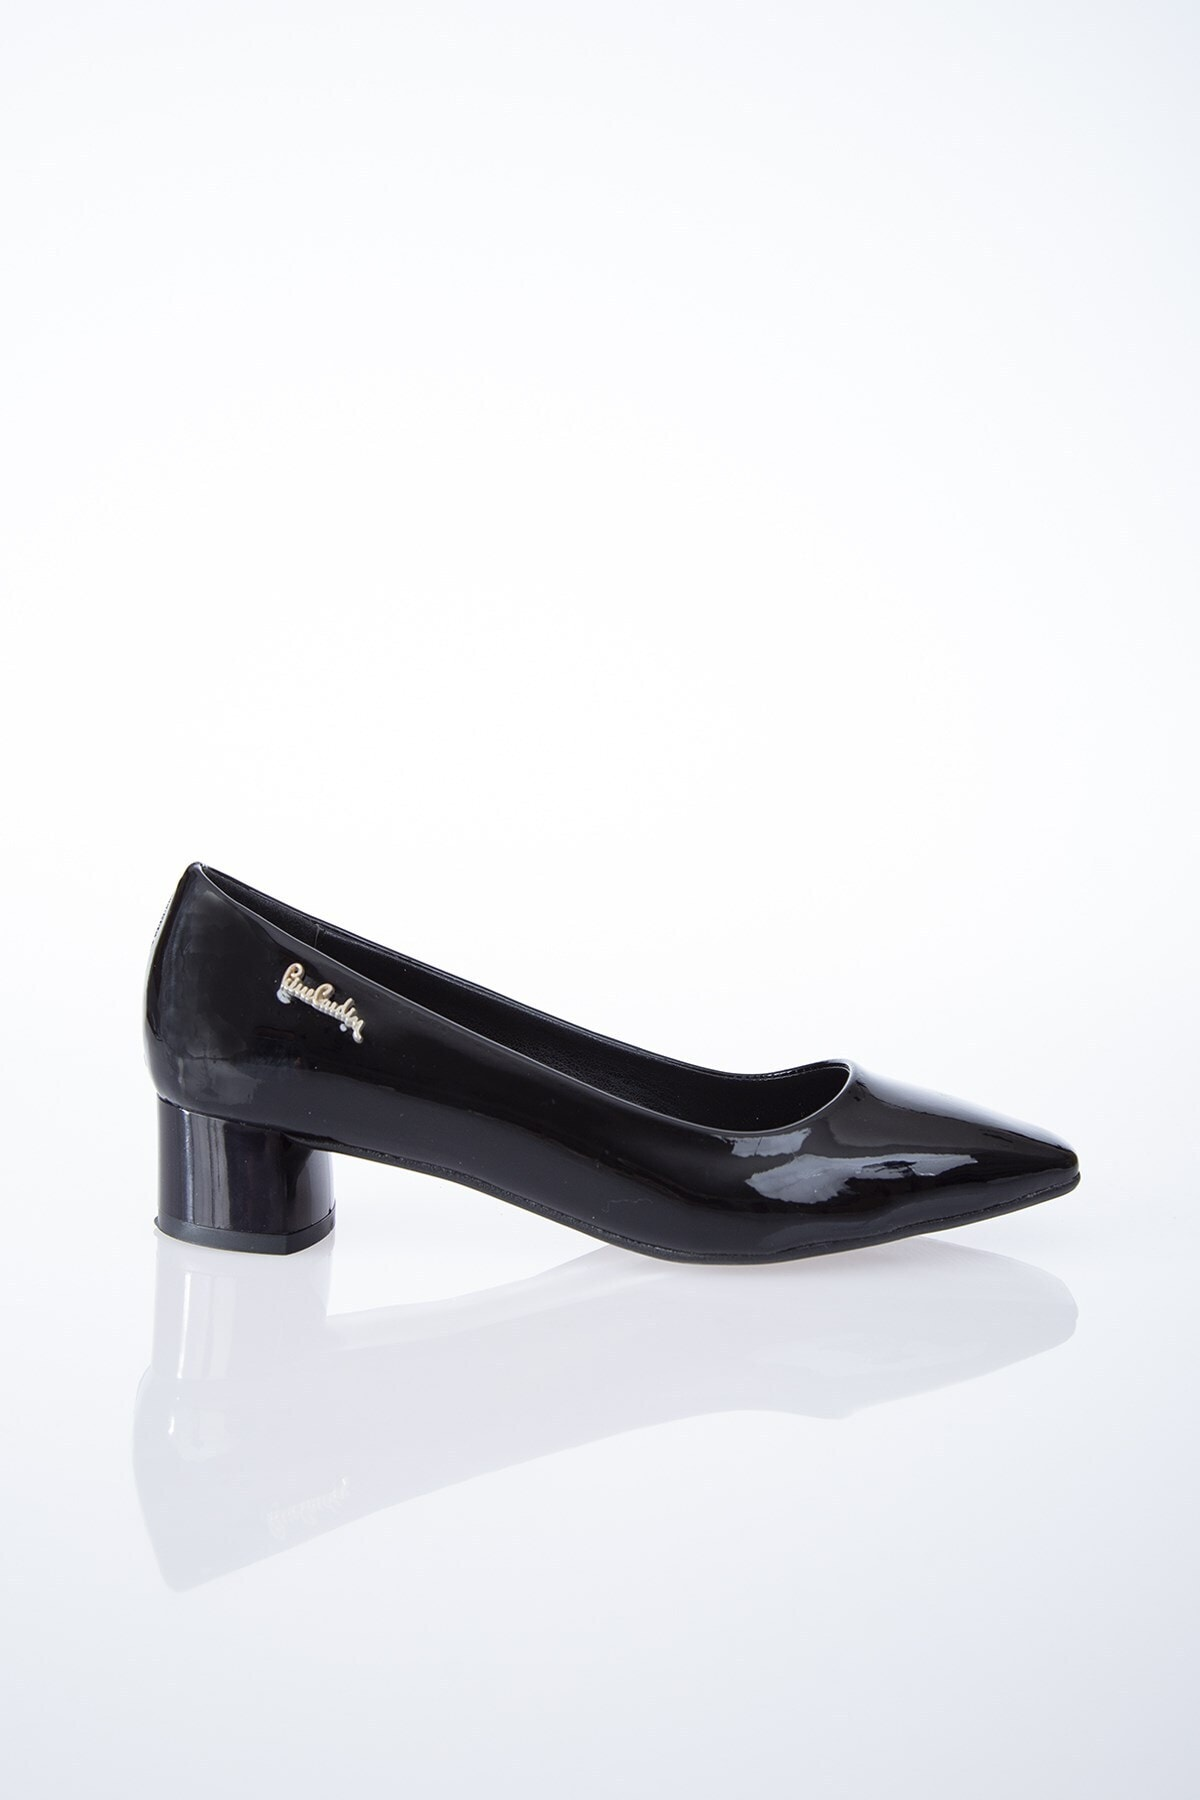 Pierre Cardin Pc-50320-siyah 1